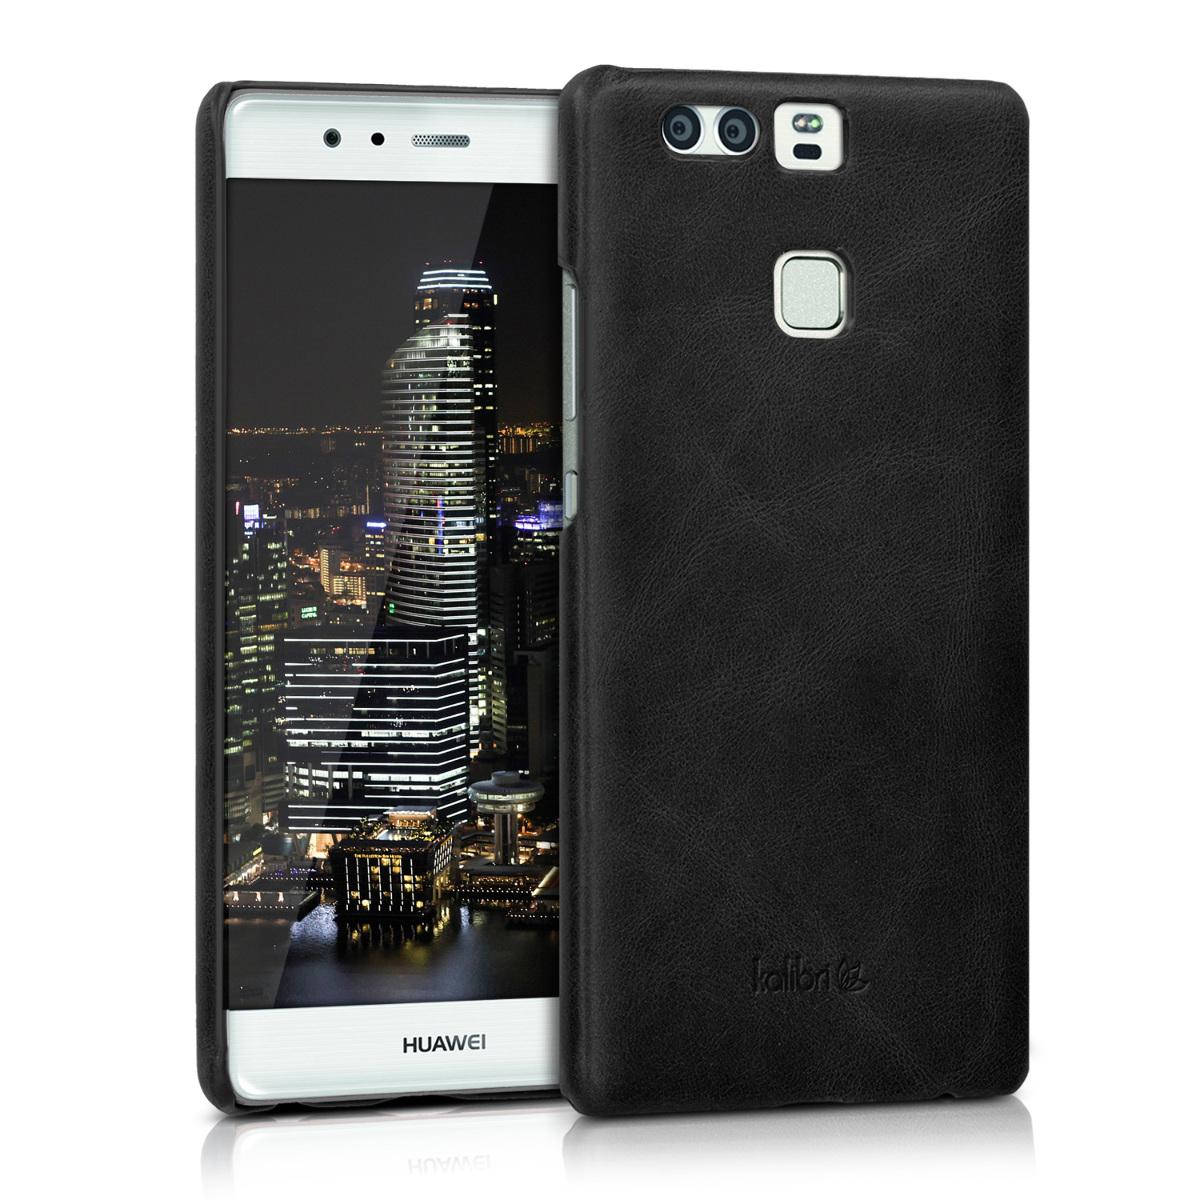 Kalibri Σκληρή Δερμάτινη Θήκη Huawei P9 - Black (38964.01)